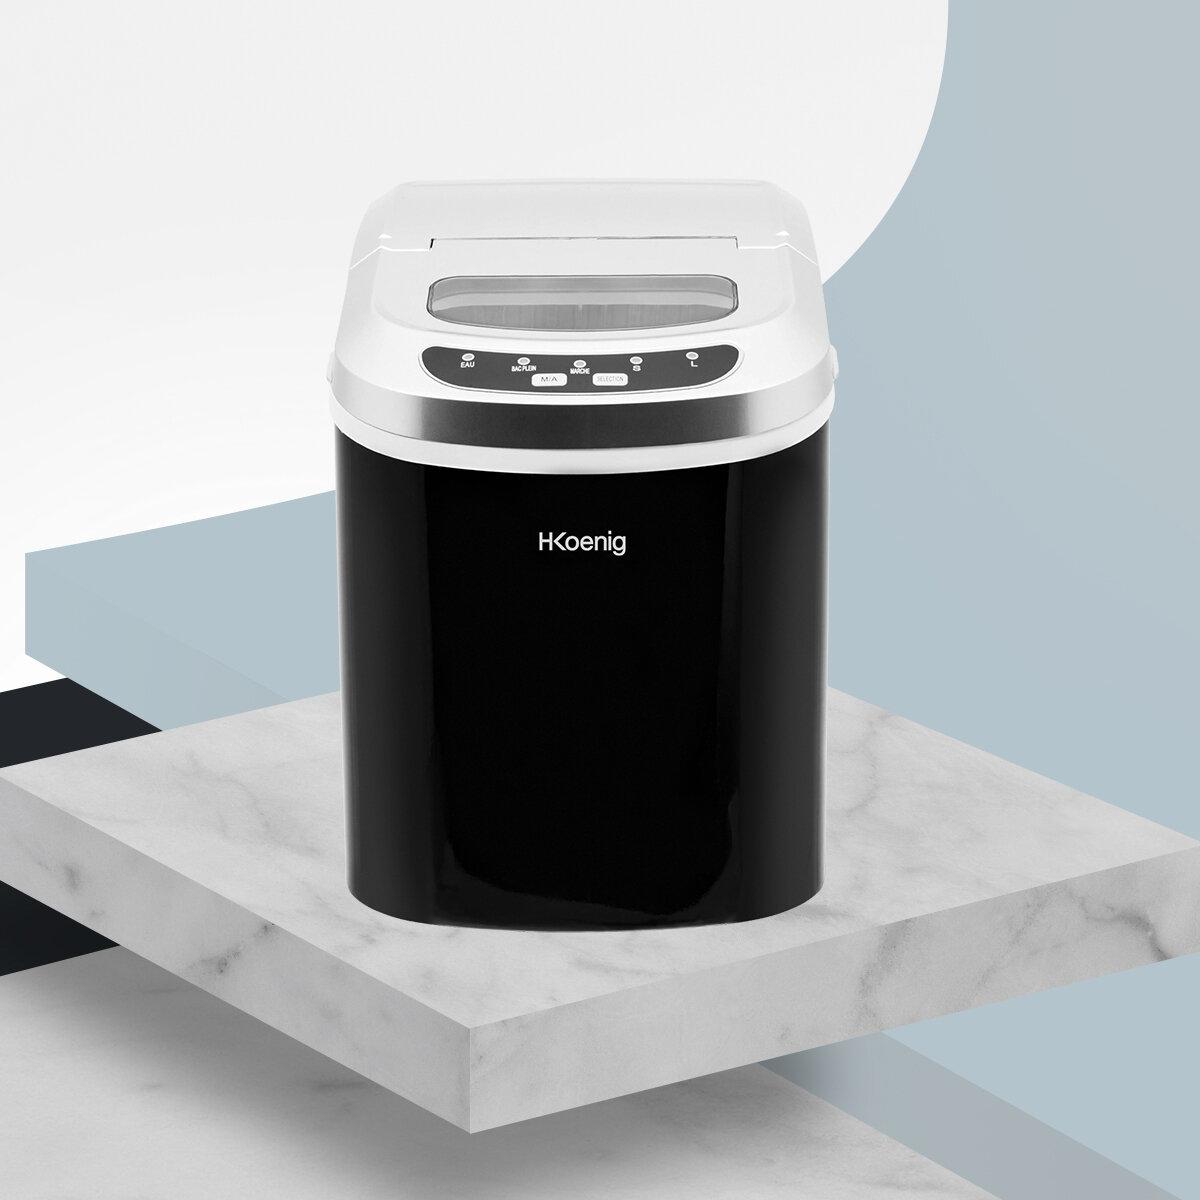 cold machine > Ice cube maker > ice cube maker : Koenig - EN